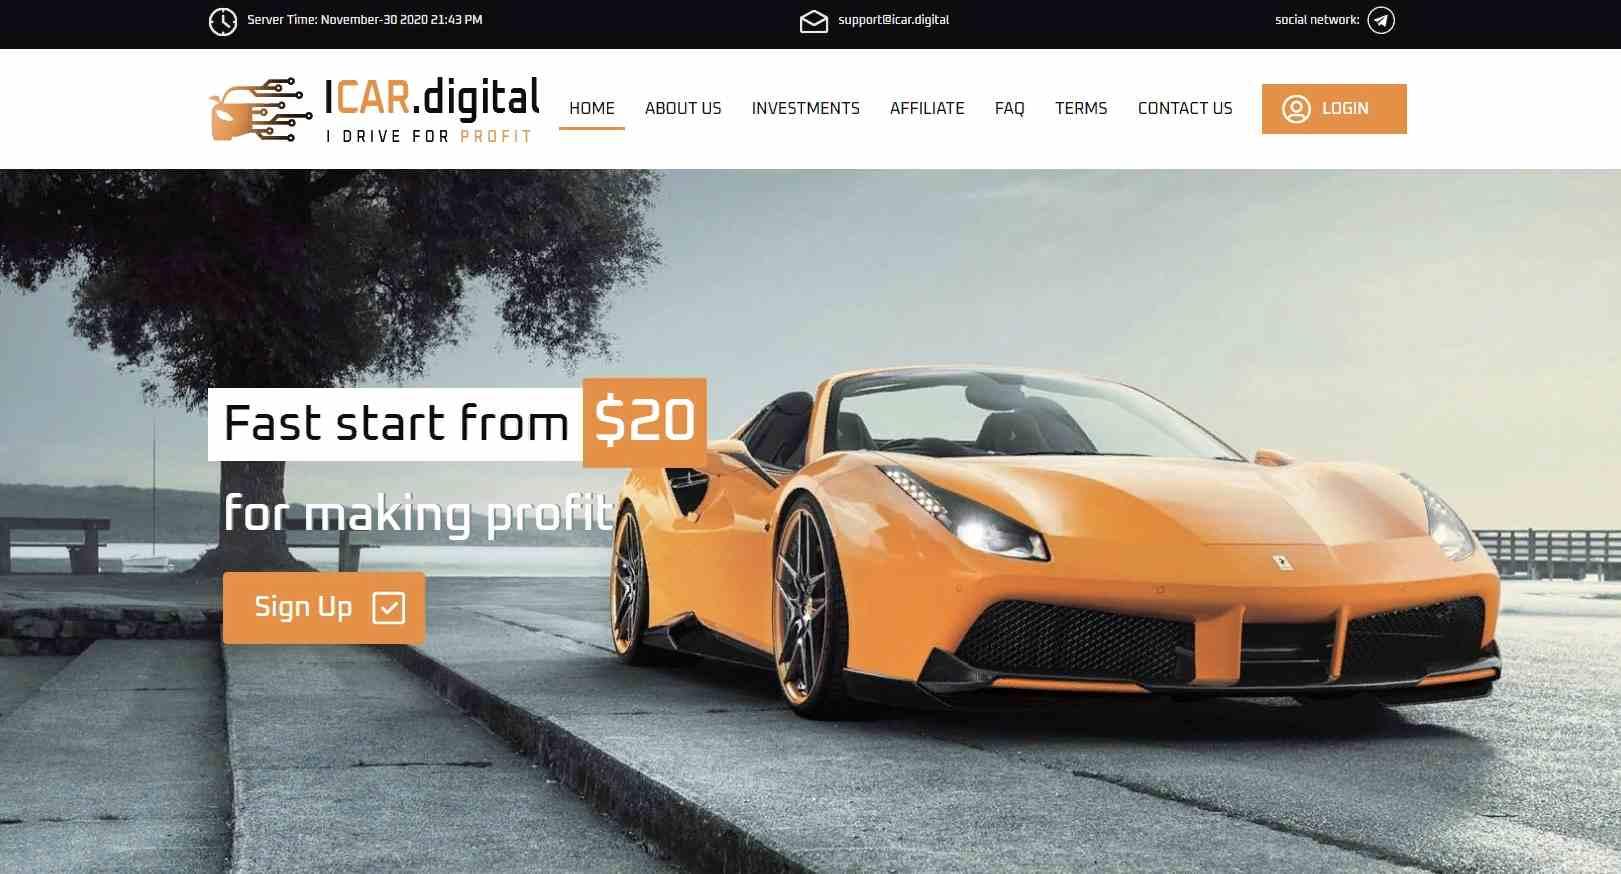 Icar-digital